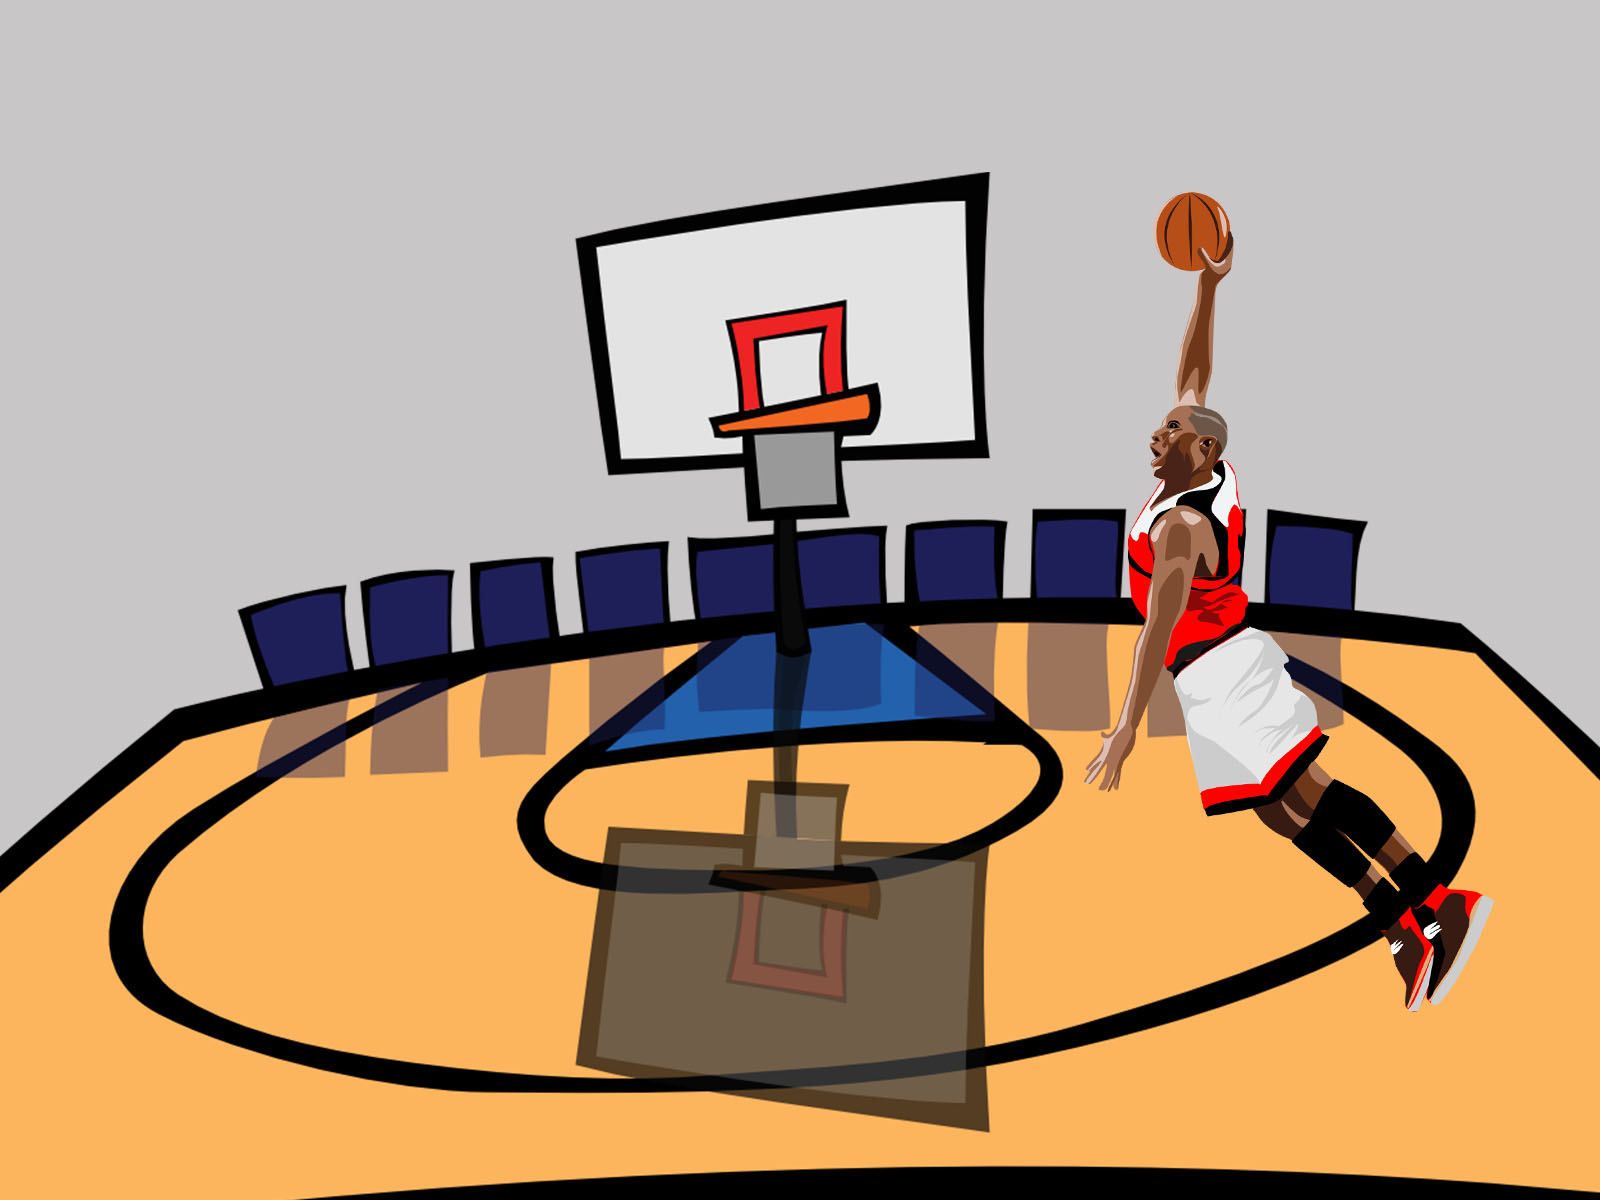 Basketball Game PPT Themes